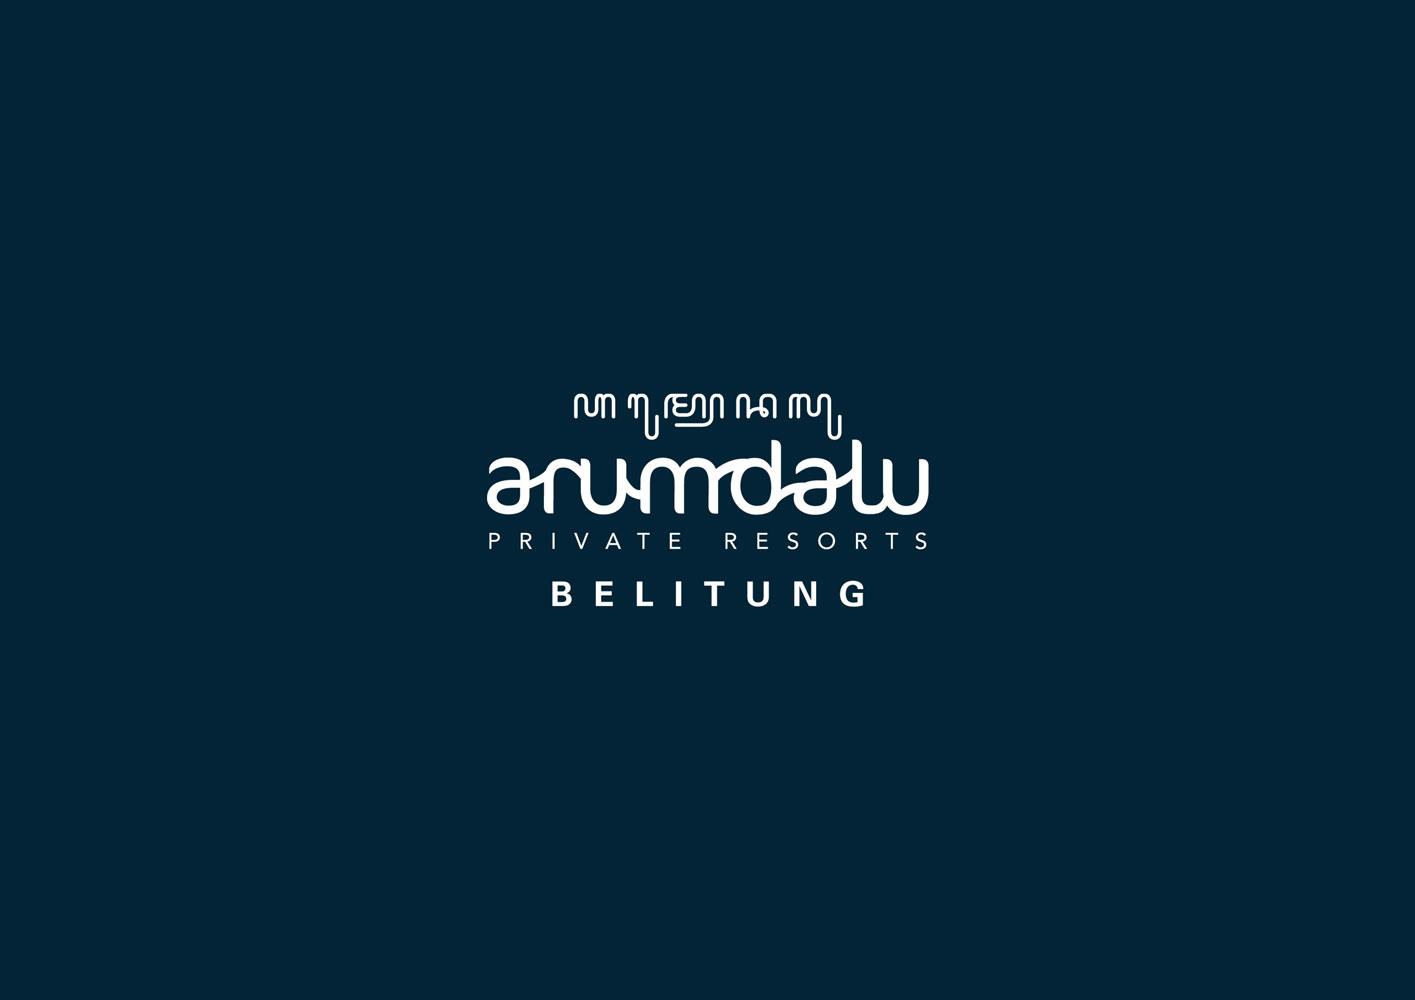 Arumdalu Belitung